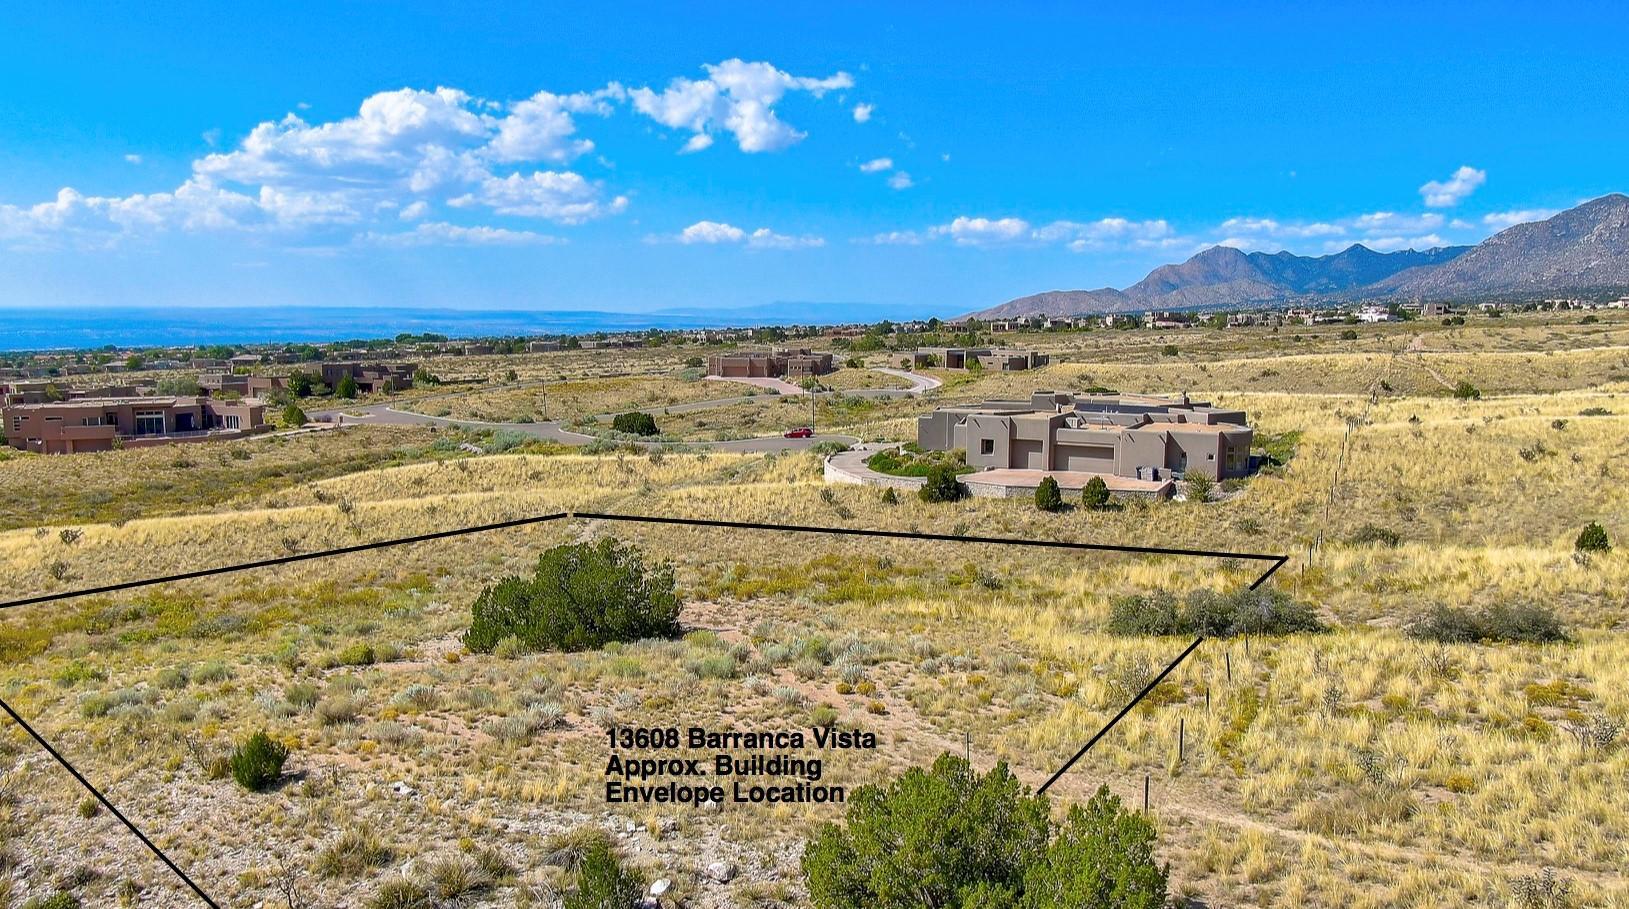 13608 BARRANCA VISTA Court NE, Albuquerque, NM 87111 - Albuquerque, NM real estate listing